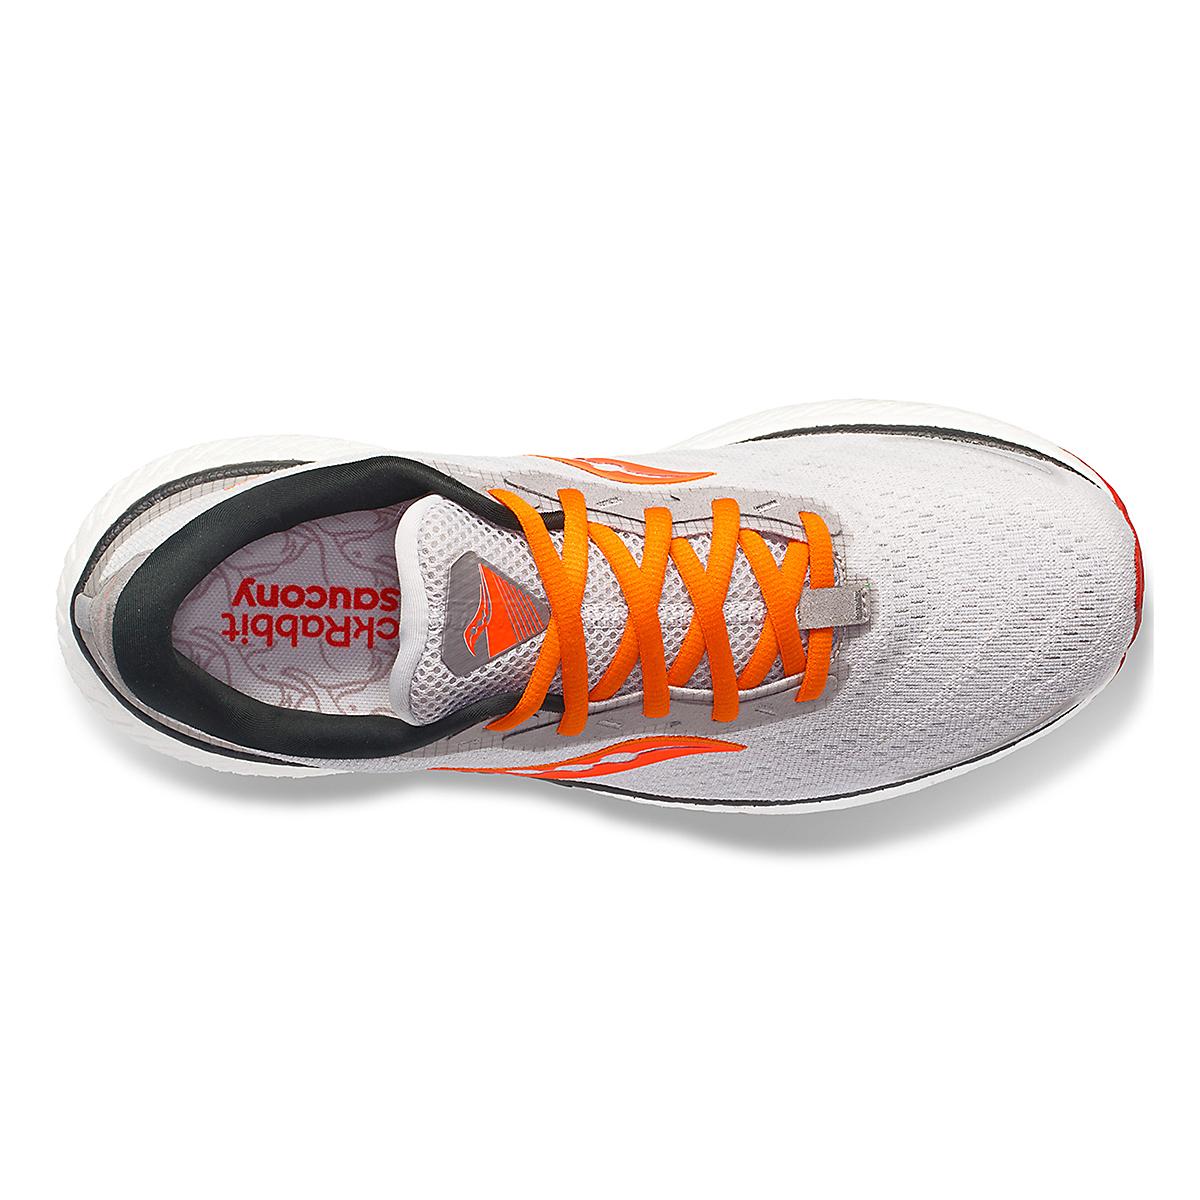 Men's Saucony Triumph 19 Running Shoe - Color: Jackalope - Size: 7 - Width: Regular, Jackalope, large, image 3